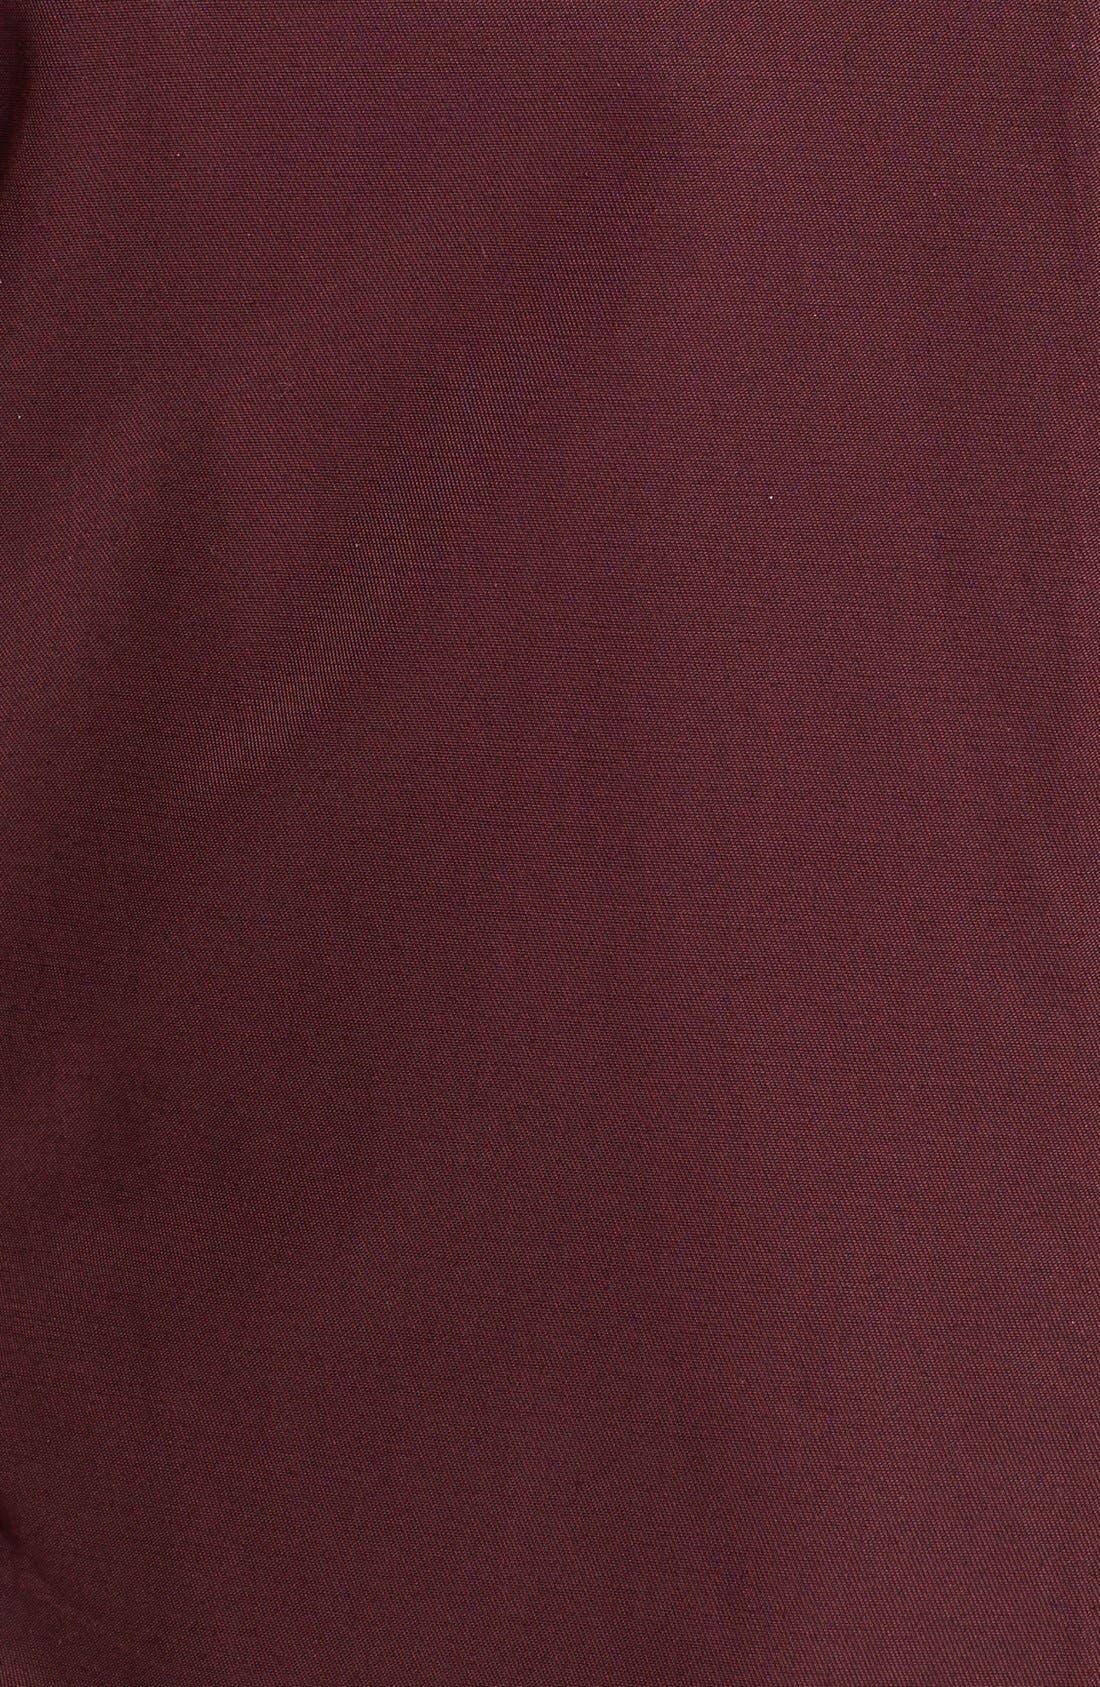 Alternate Image 3  - Via Spiga Asymmetrical Faux Leather Trim Raincoat (Online Only)